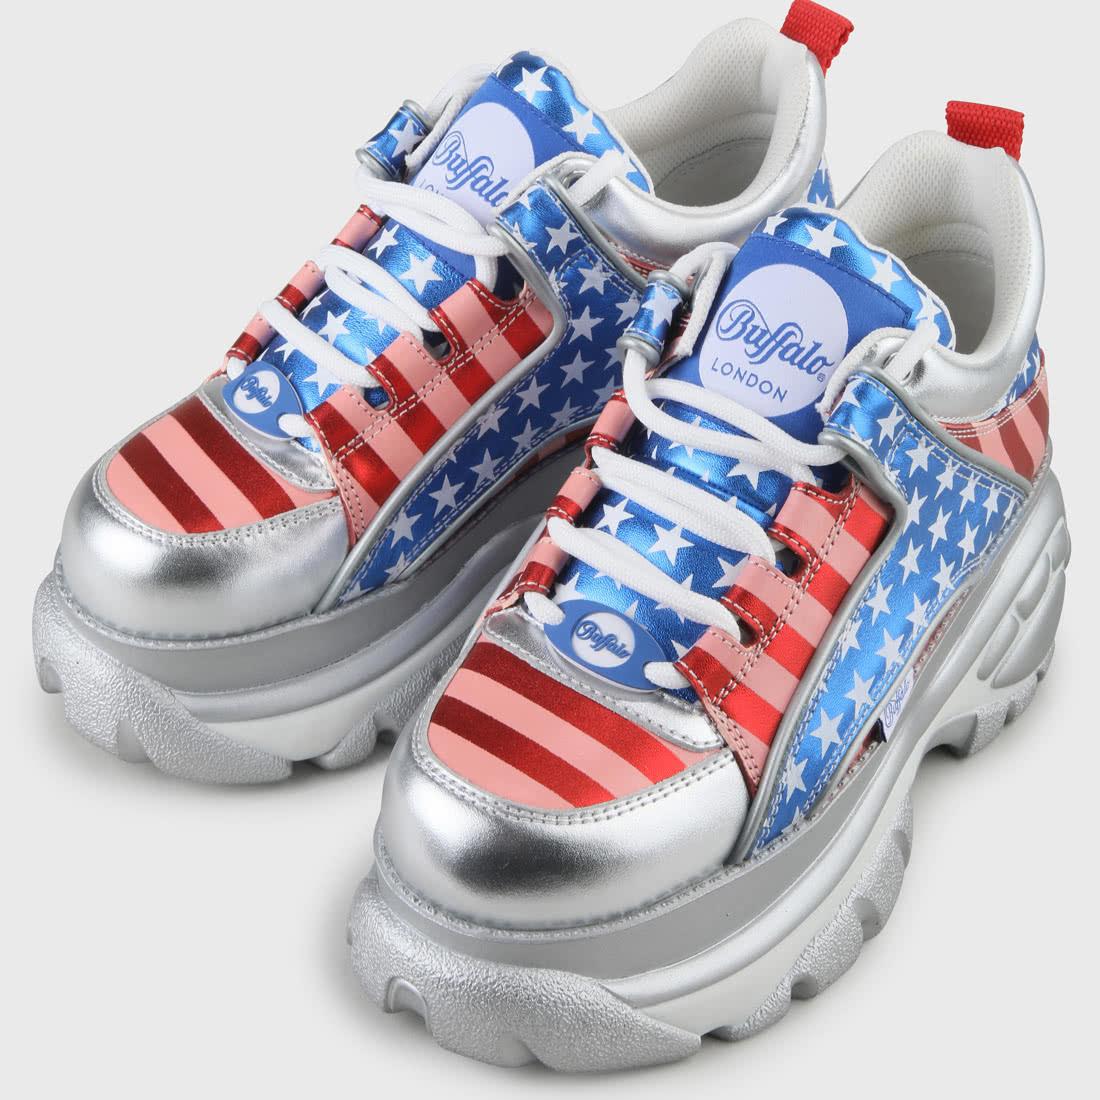 Flagge Blau Rot: Buffalo Classic Sneaker USA-Flagge Rot/blau Online Kaufen